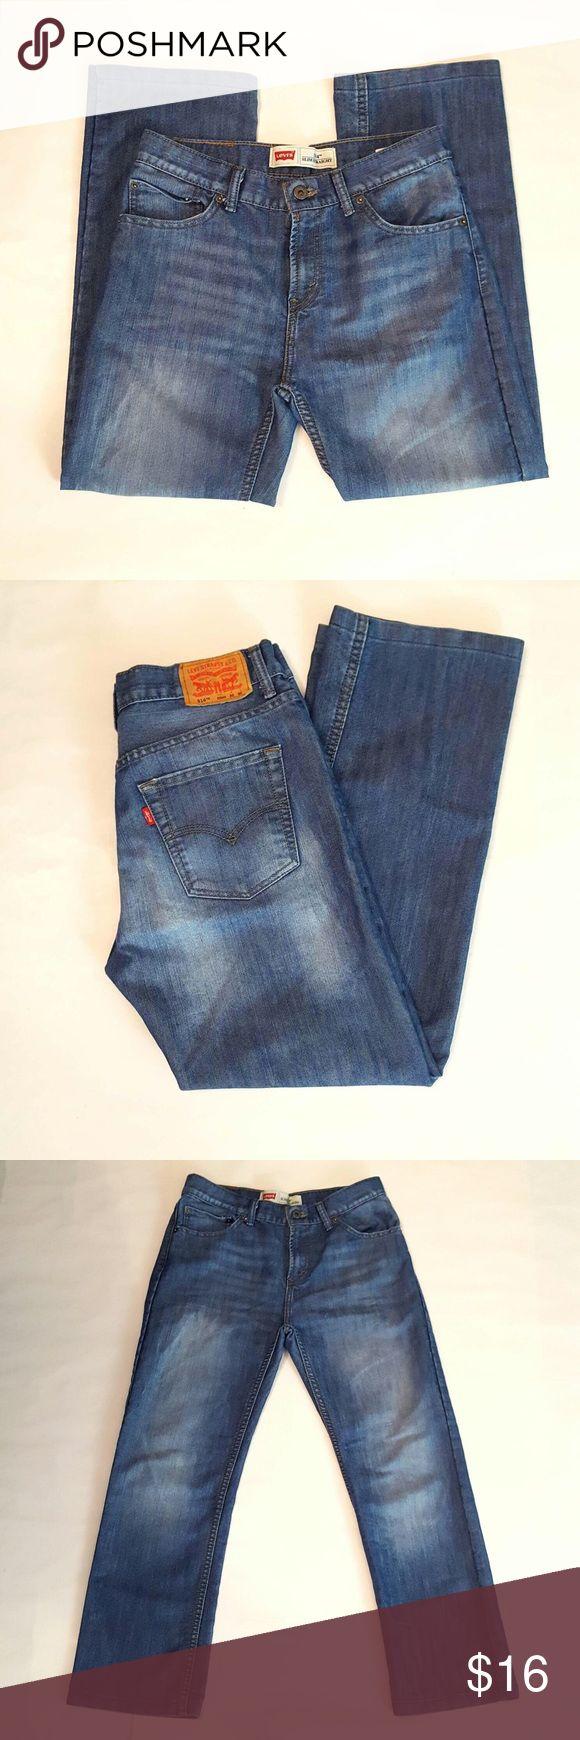 "🔵Levi's 514 Slim Straight Jeans Levi's 514 Slim Straight Jeans. Size 20 Reg. Measurements: W30"" x L30"", W76cm. 26 1/2"" inseam. Levi's Jeans Straight Leg"